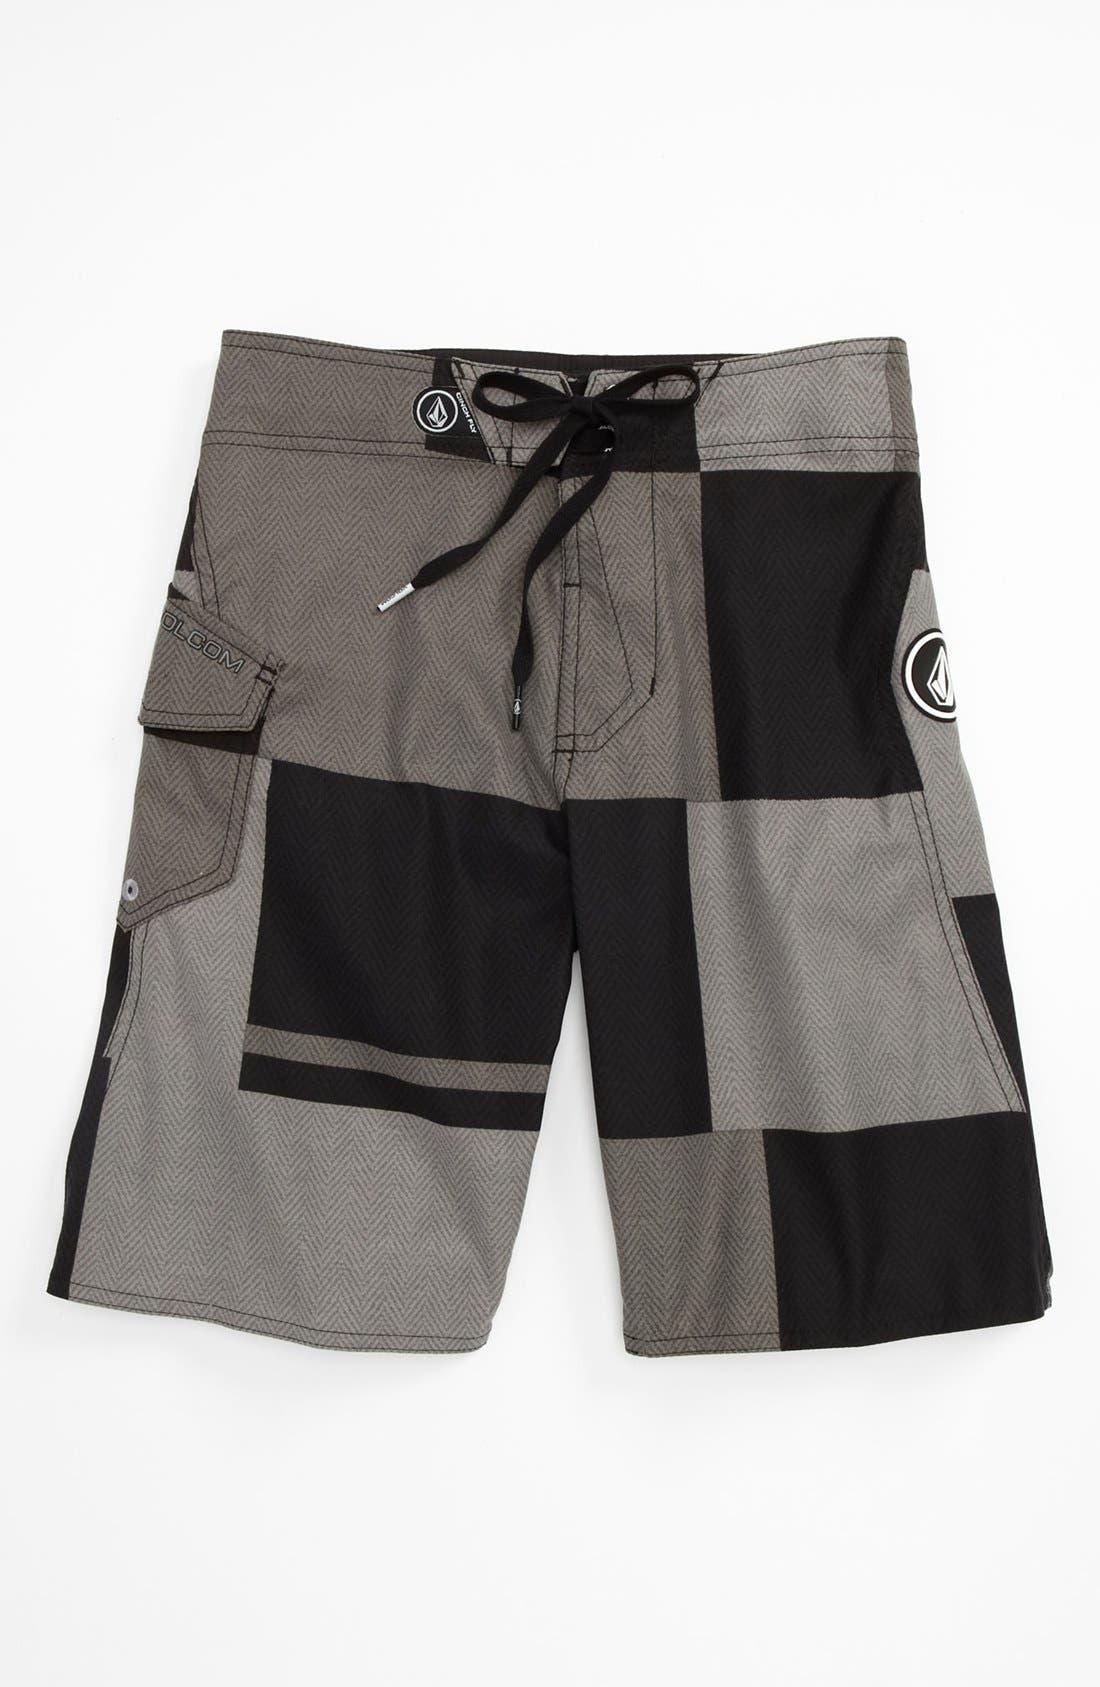 Alternate Image 1 Selected - Volcom 'Maguro' Colorblocked Board Shorts (Big Boys)